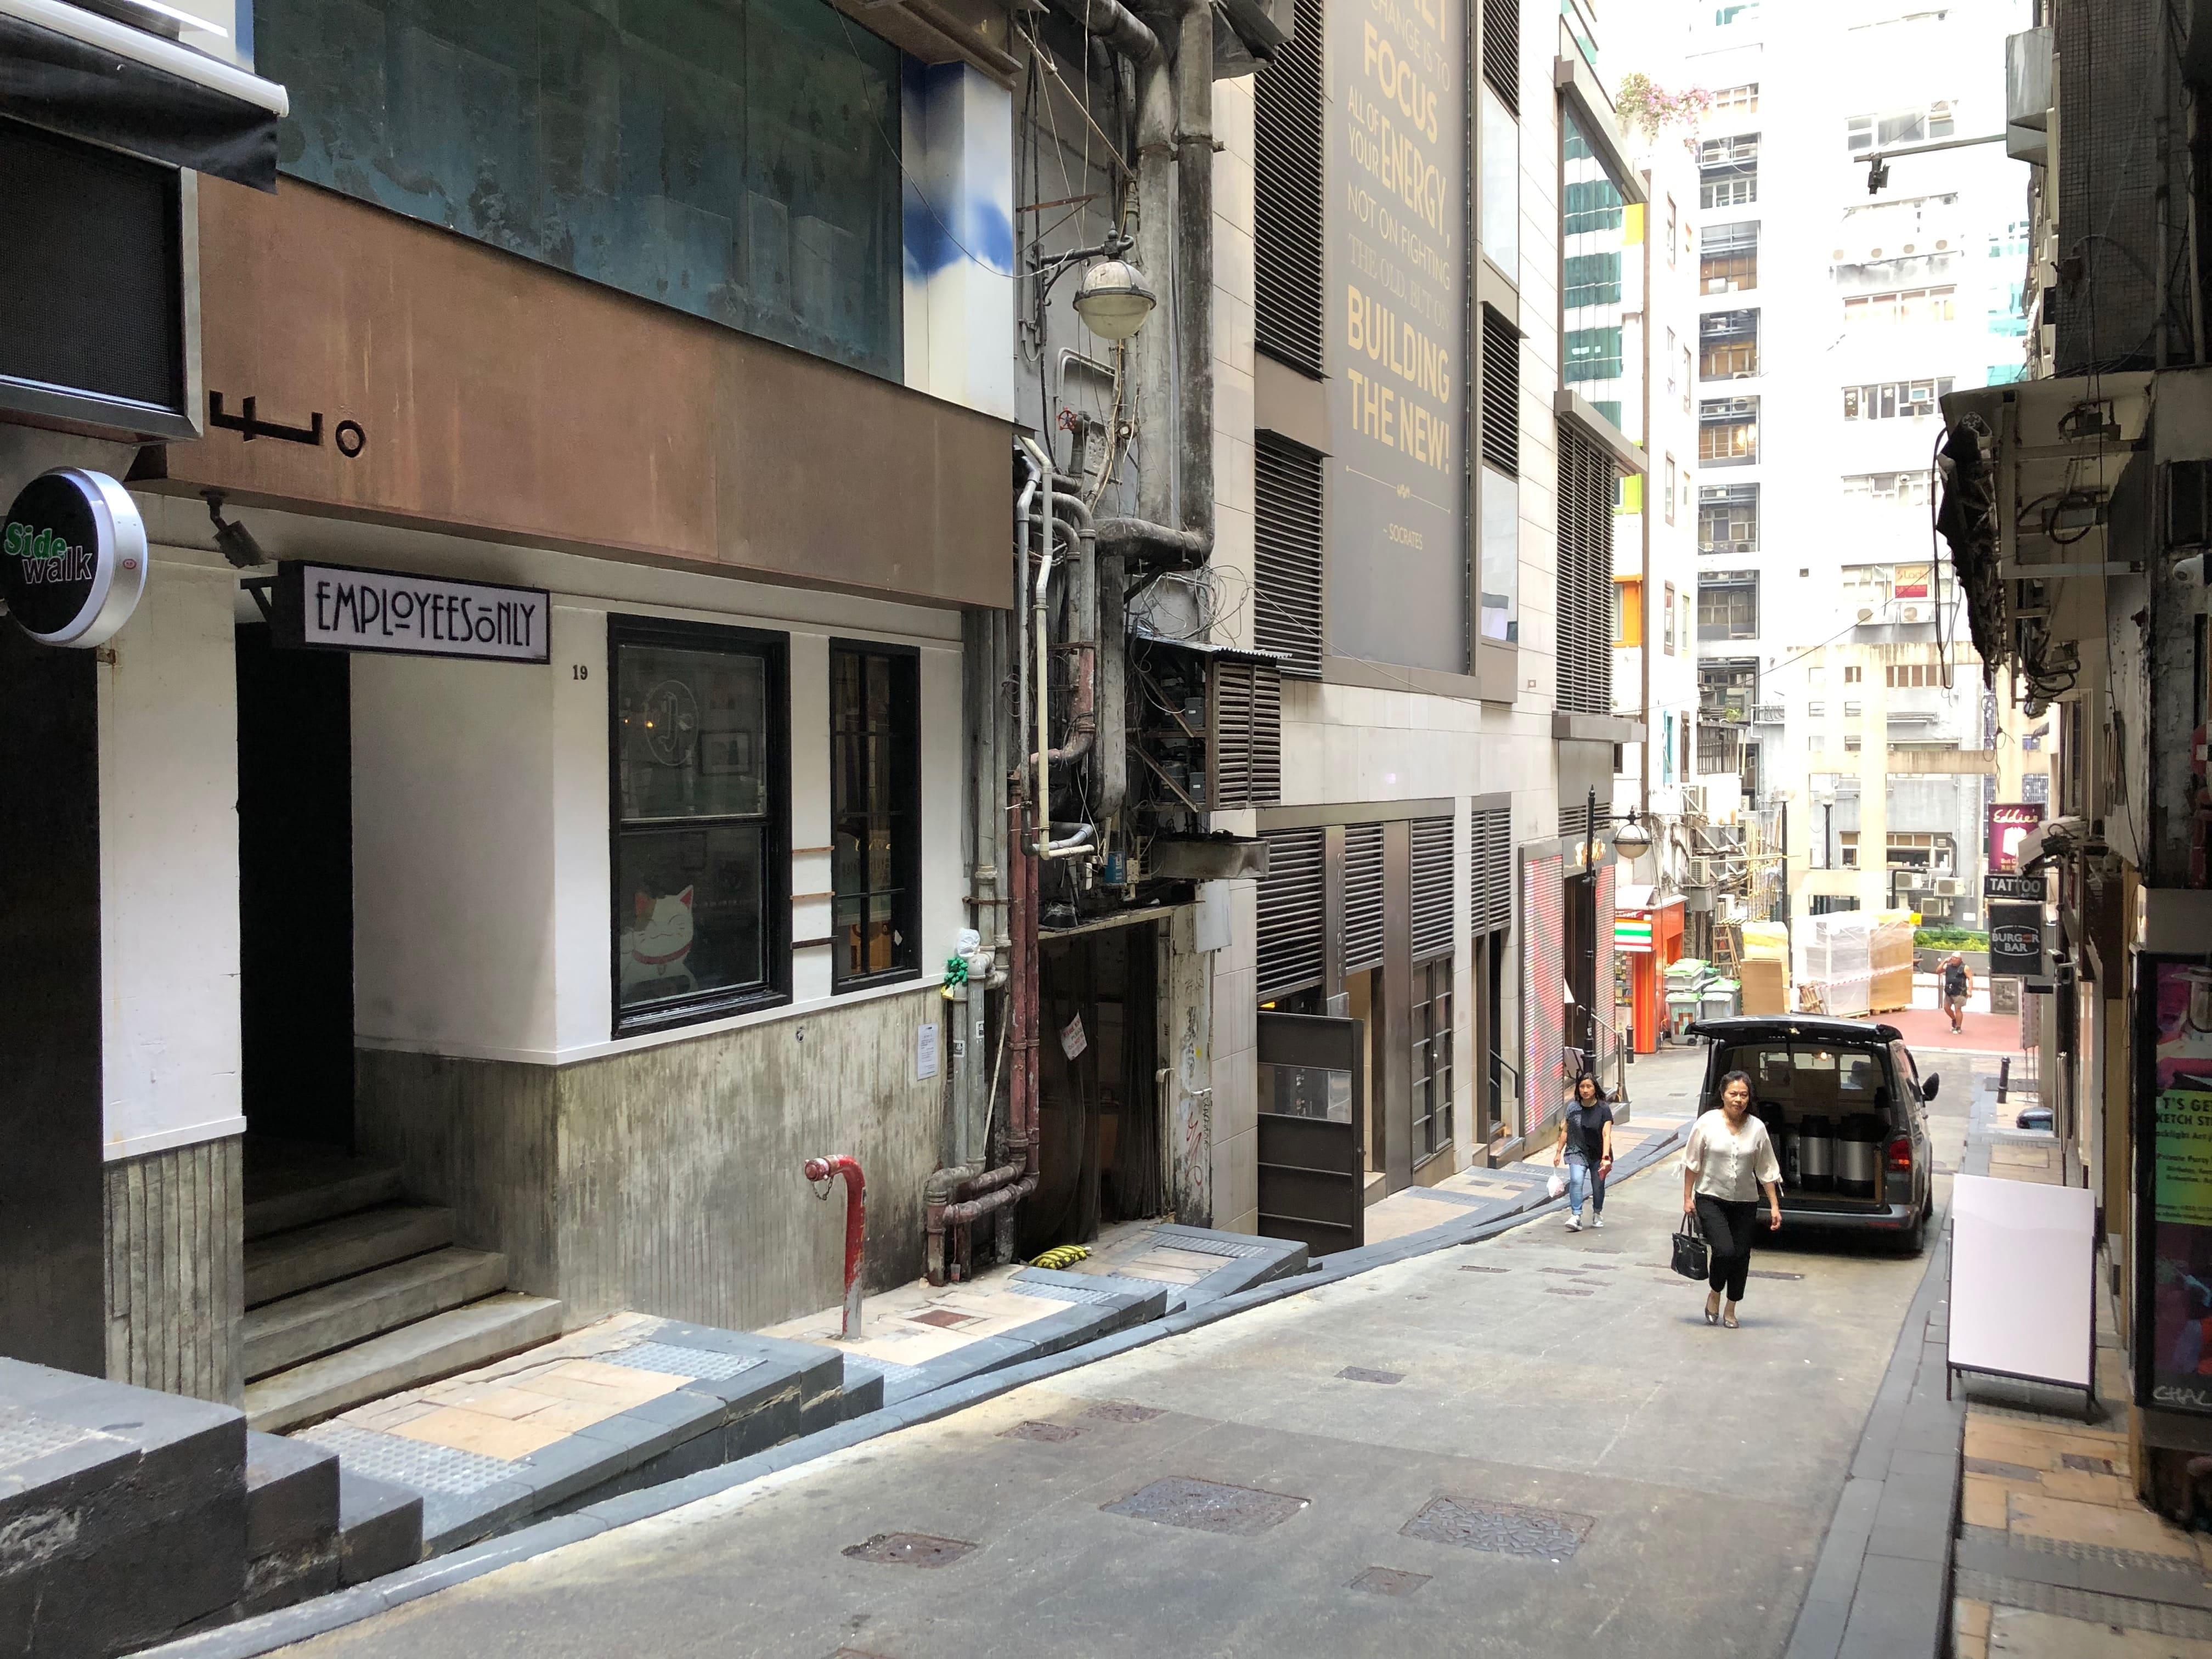 LKF Efficient FB Shop for Rent in Hong Kong